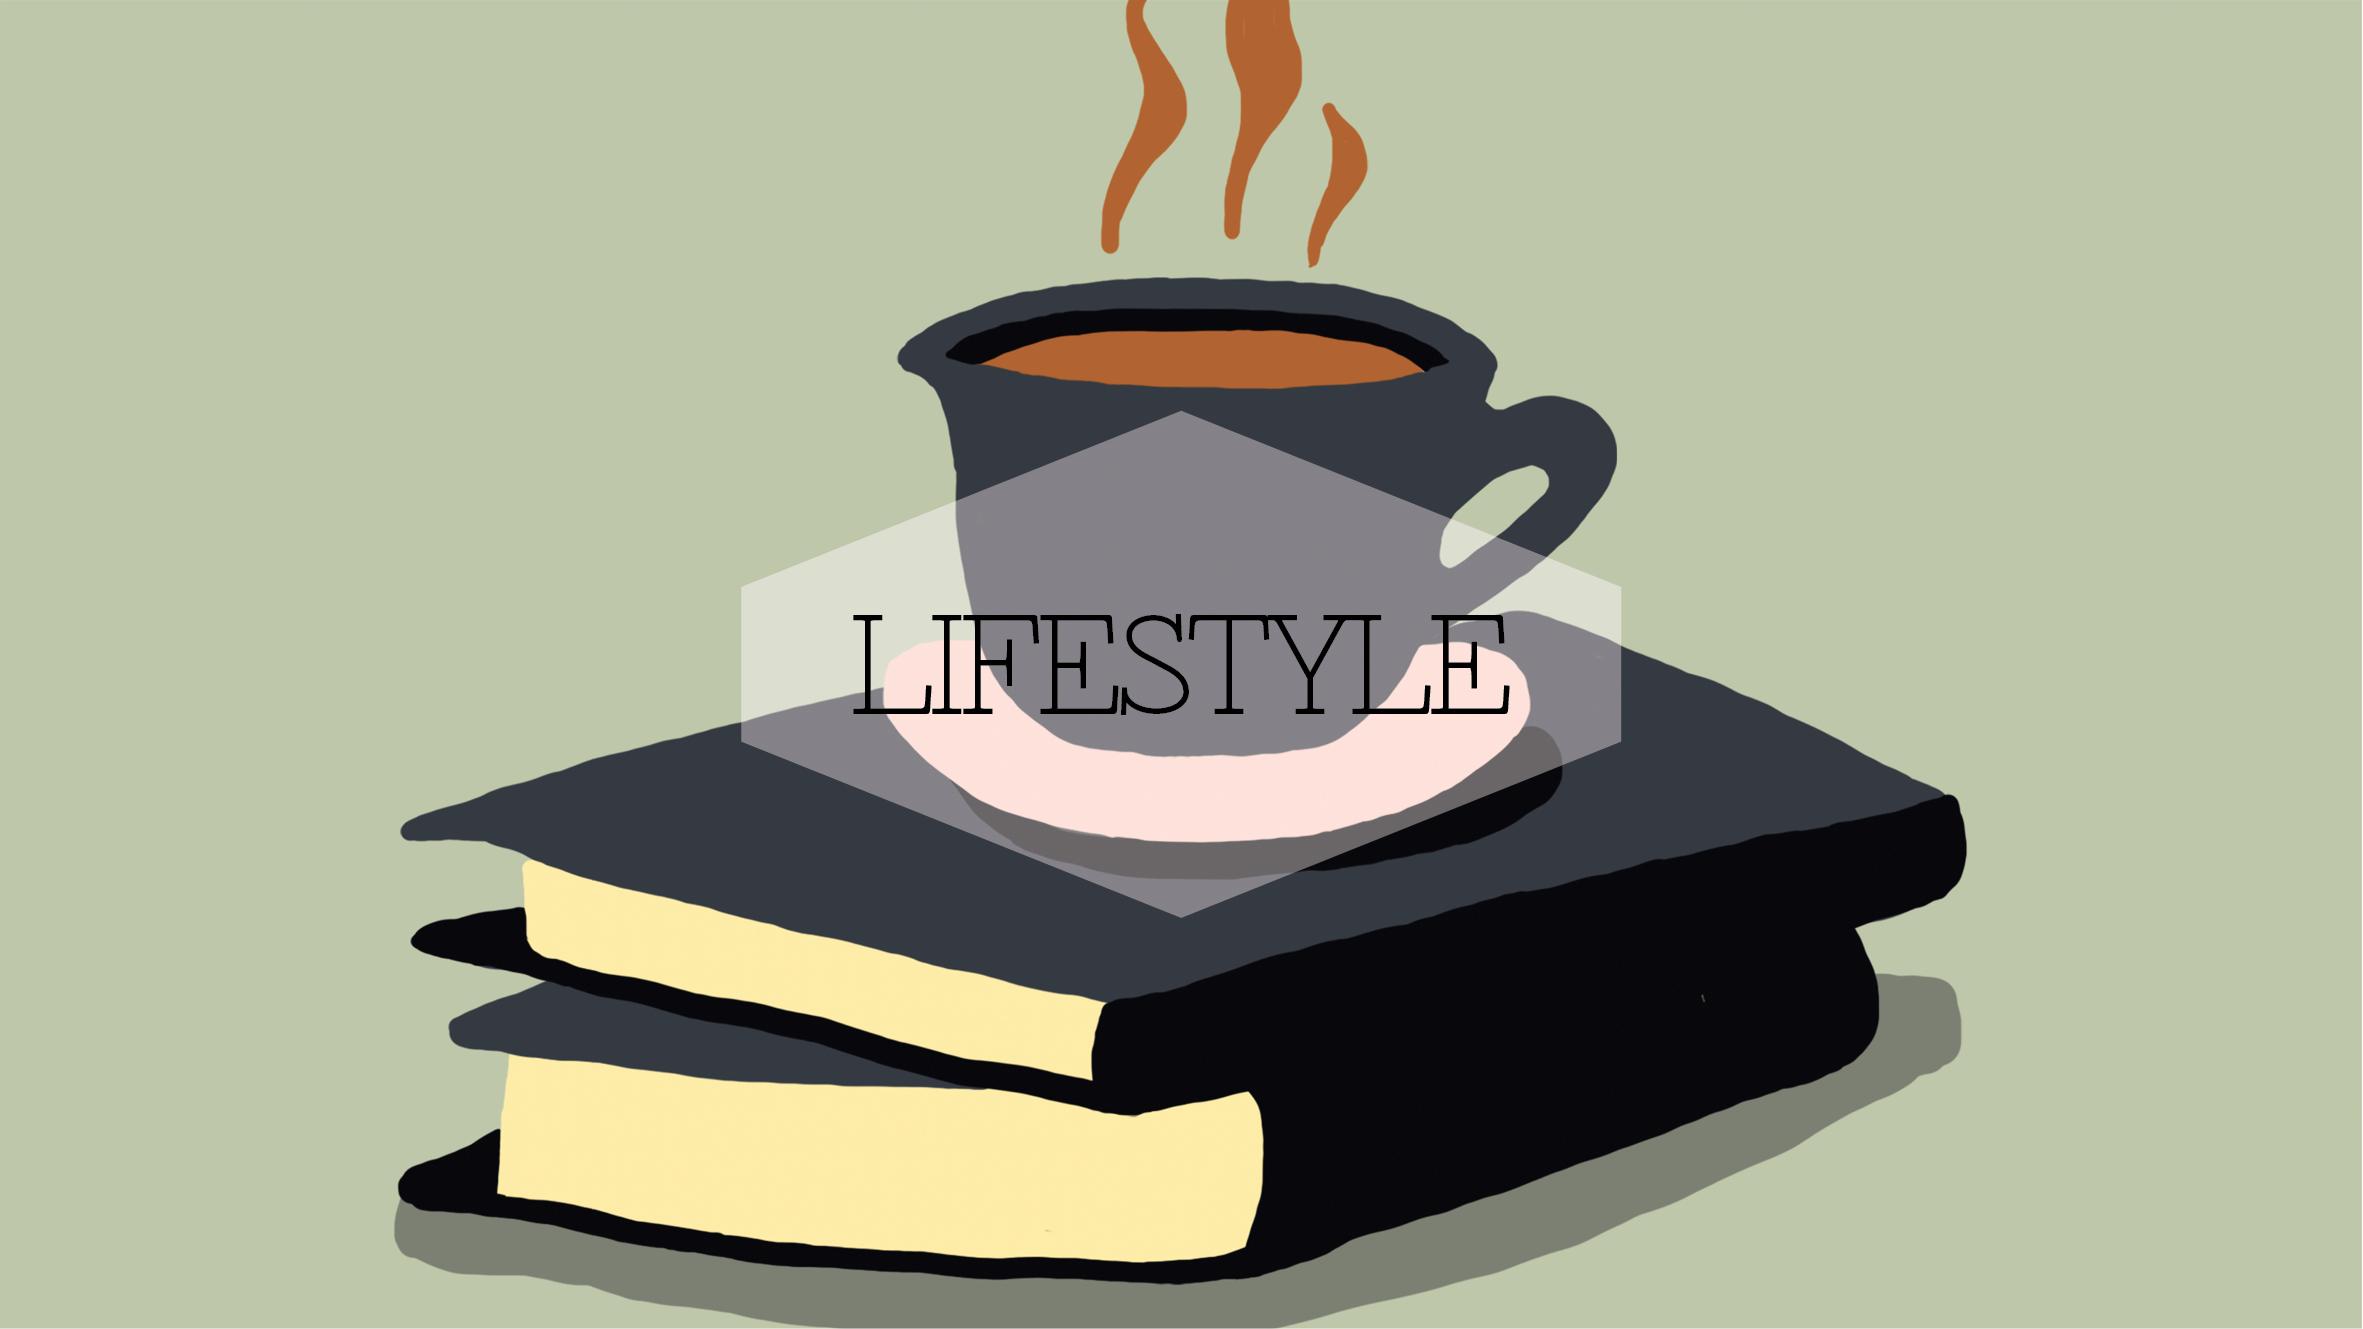 portfolio journaliste lifetyle